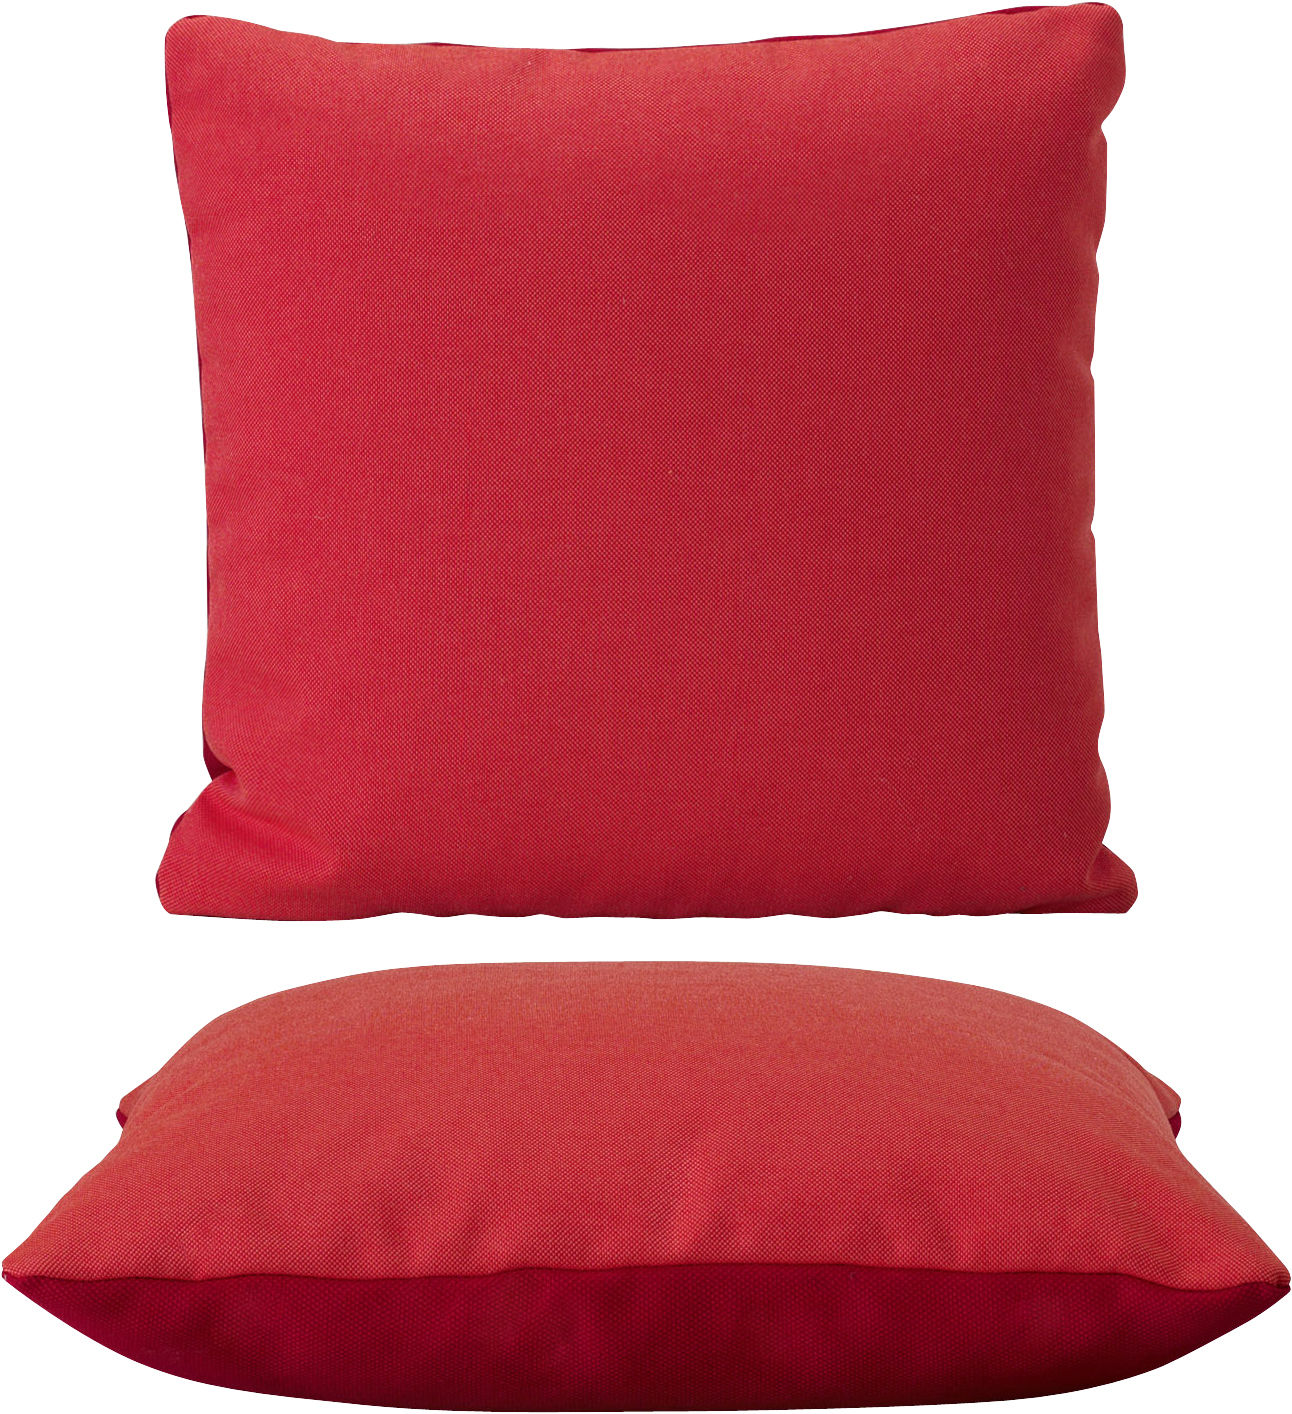 coussin mingle carr large 60 x 60 cm rouge bordeaux rouge n on muuto. Black Bedroom Furniture Sets. Home Design Ideas